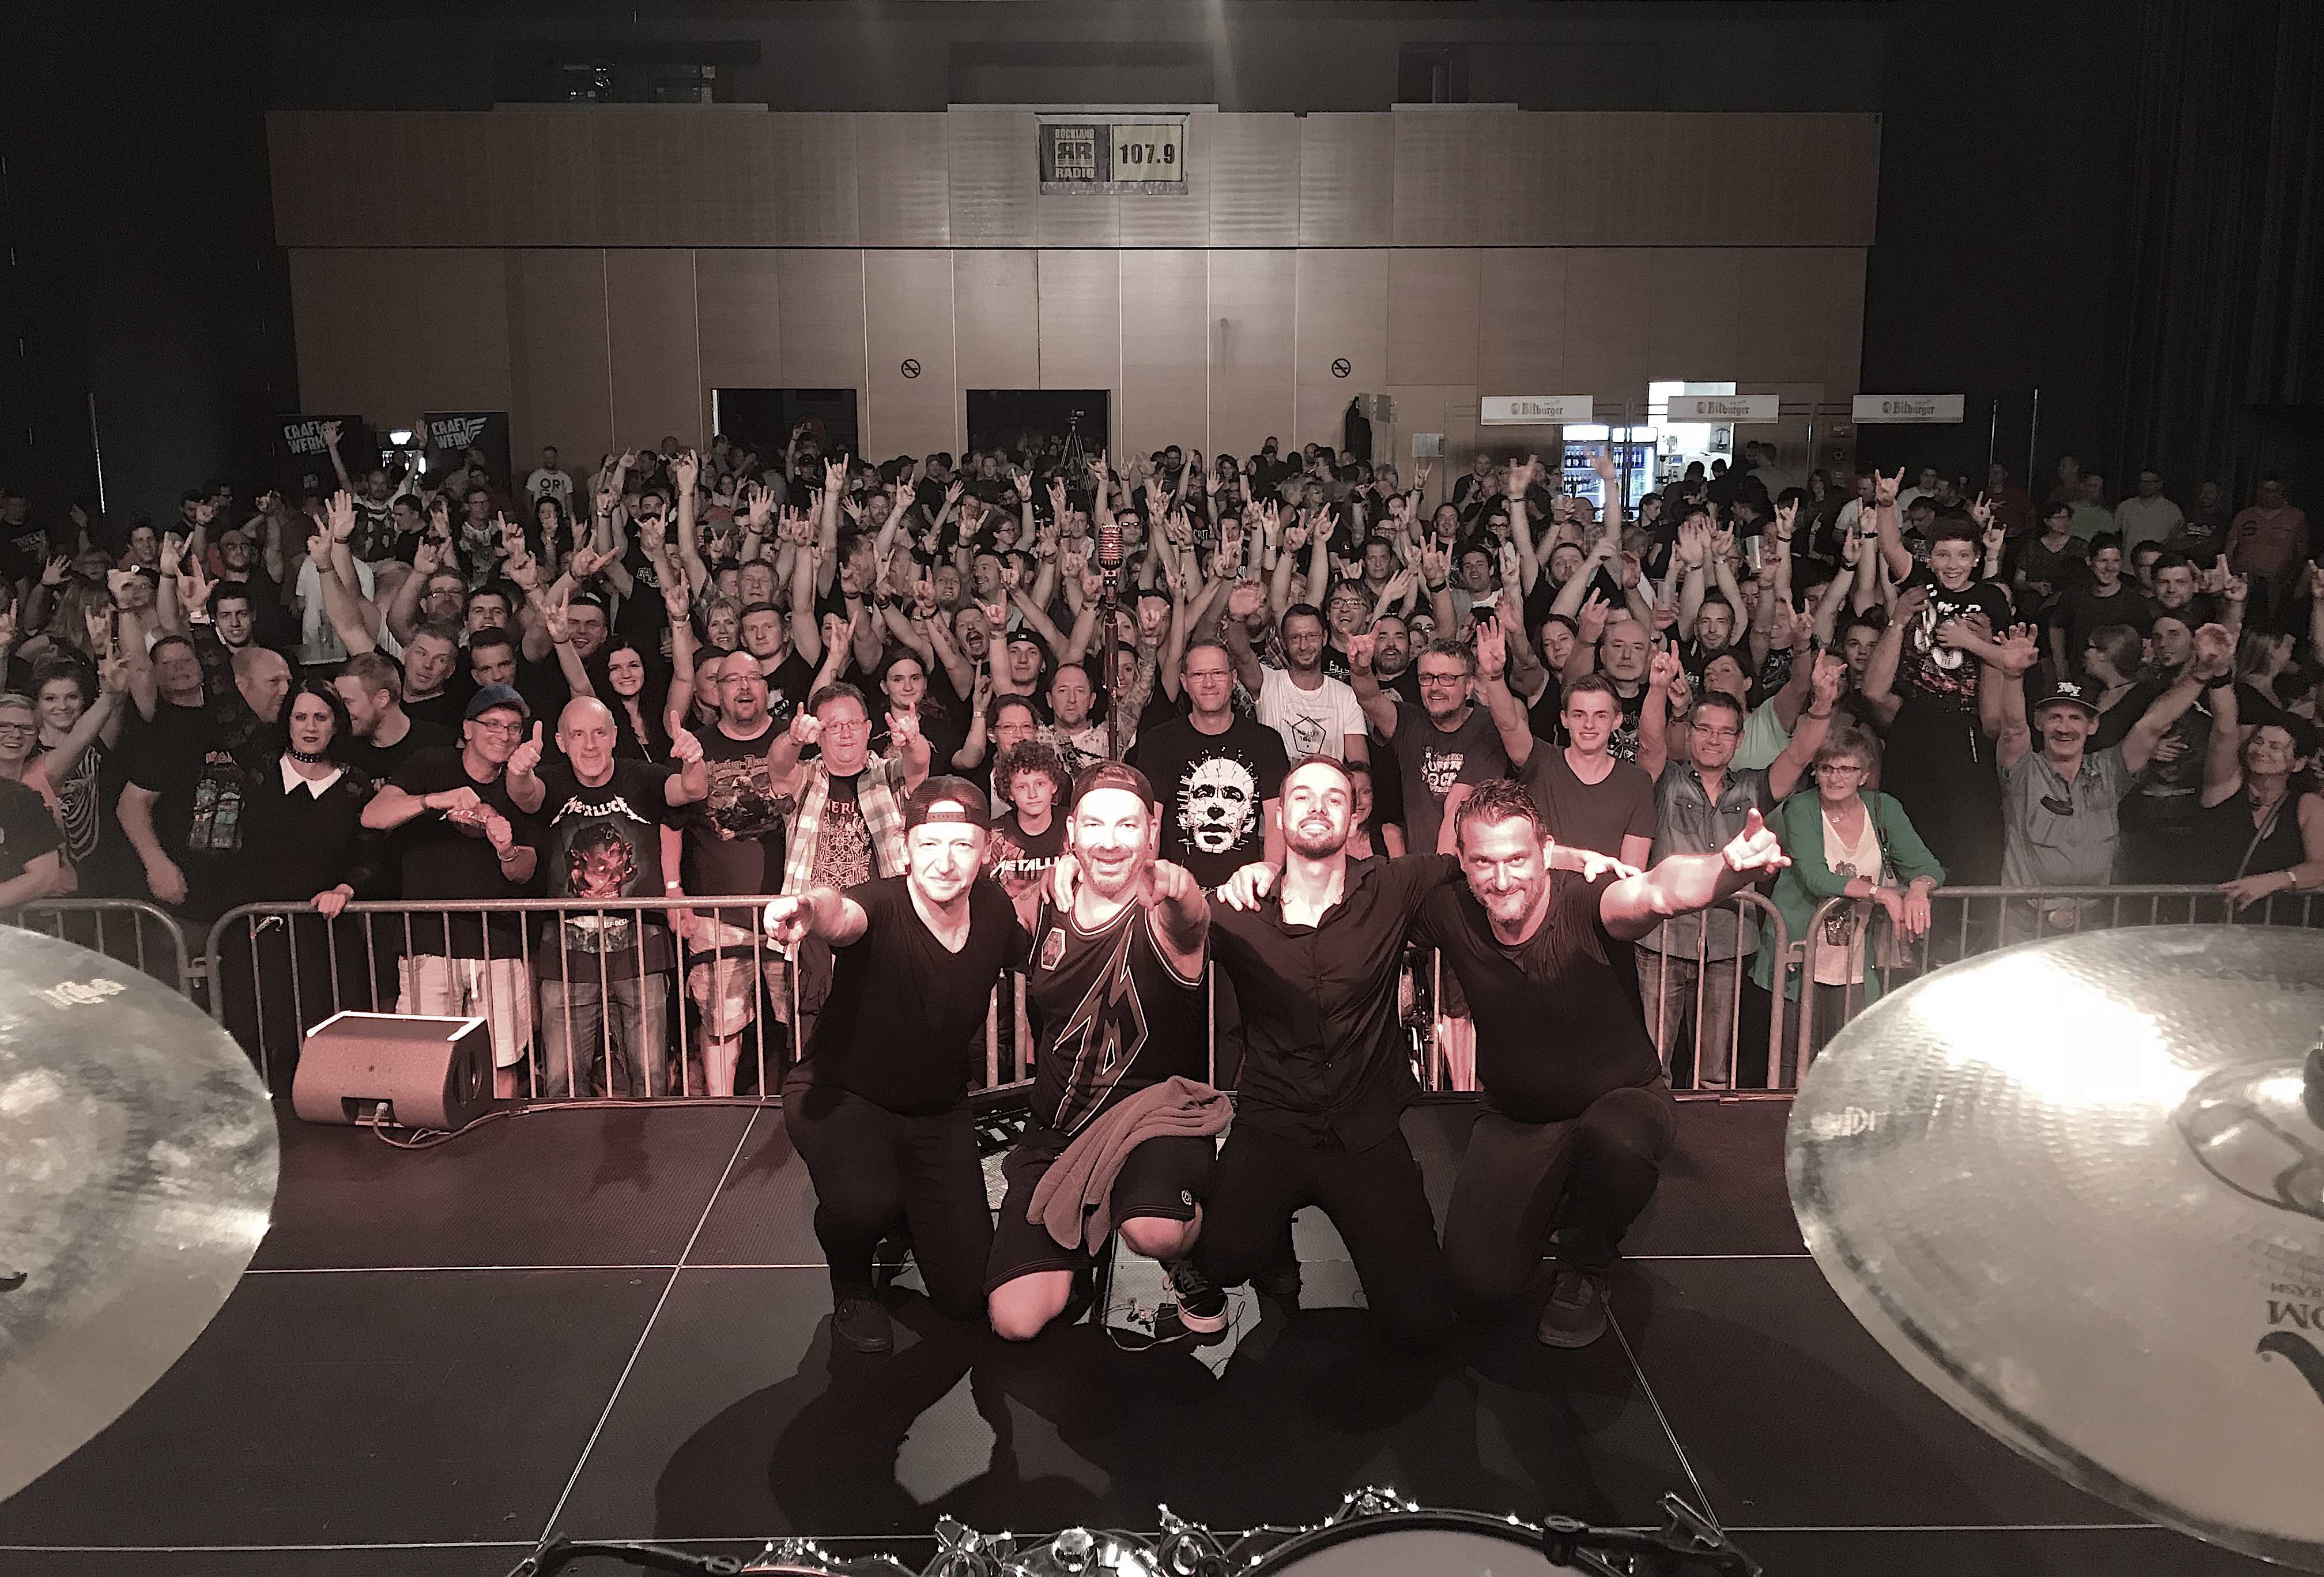 metallica-tribute-band-mytallica-rocknacht-bitburg-stadthalle-2018-publikum-thankyou